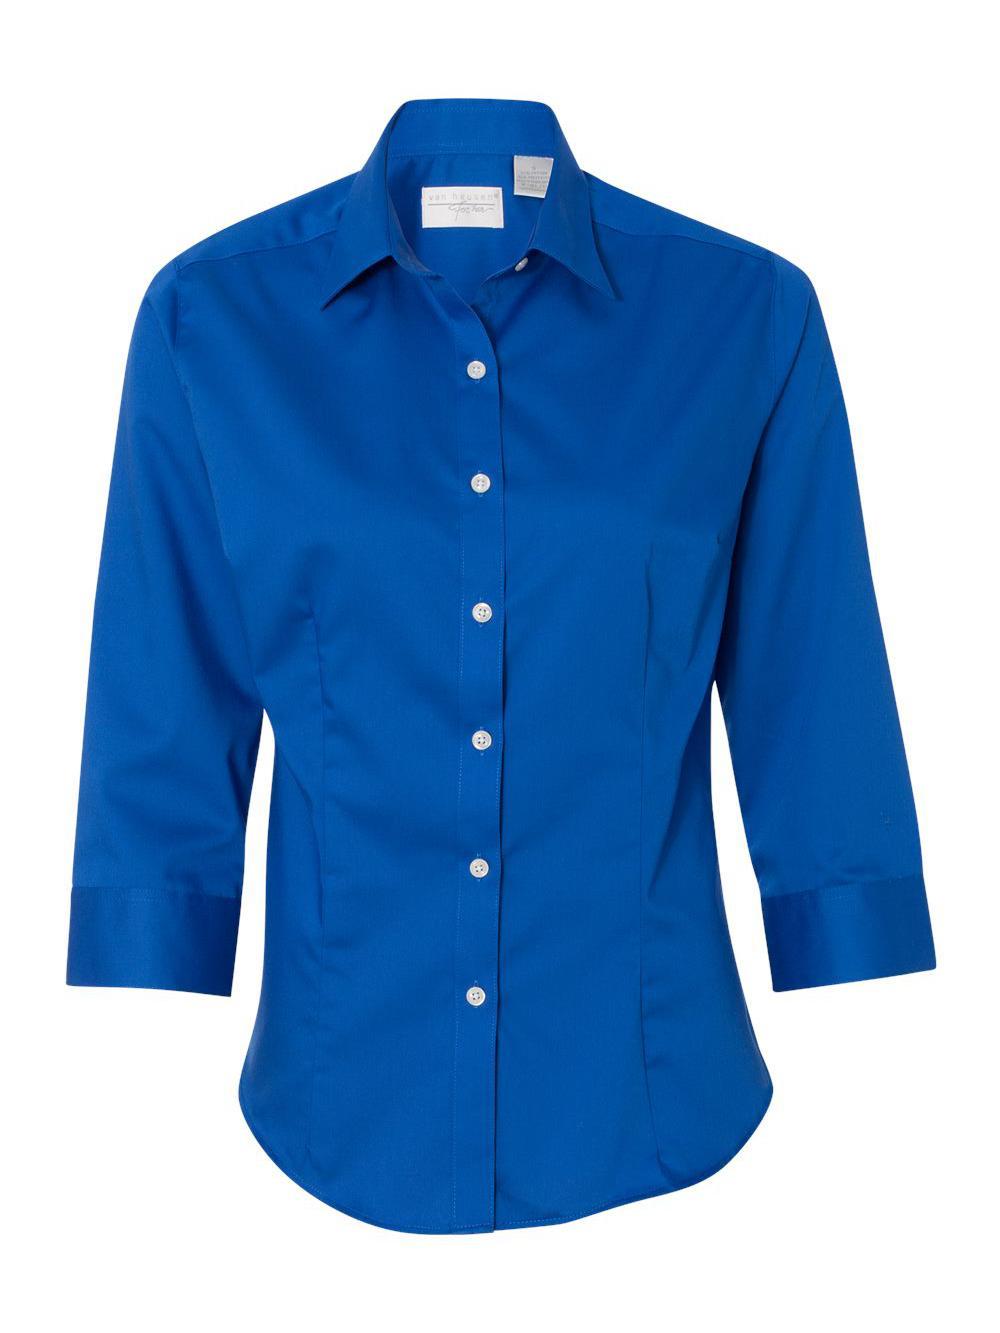 Van-Heusen-Women-039-s-Three-Quarter-Sleeve-Baby-Twill-Shirt-13V0527 thumbnail 12